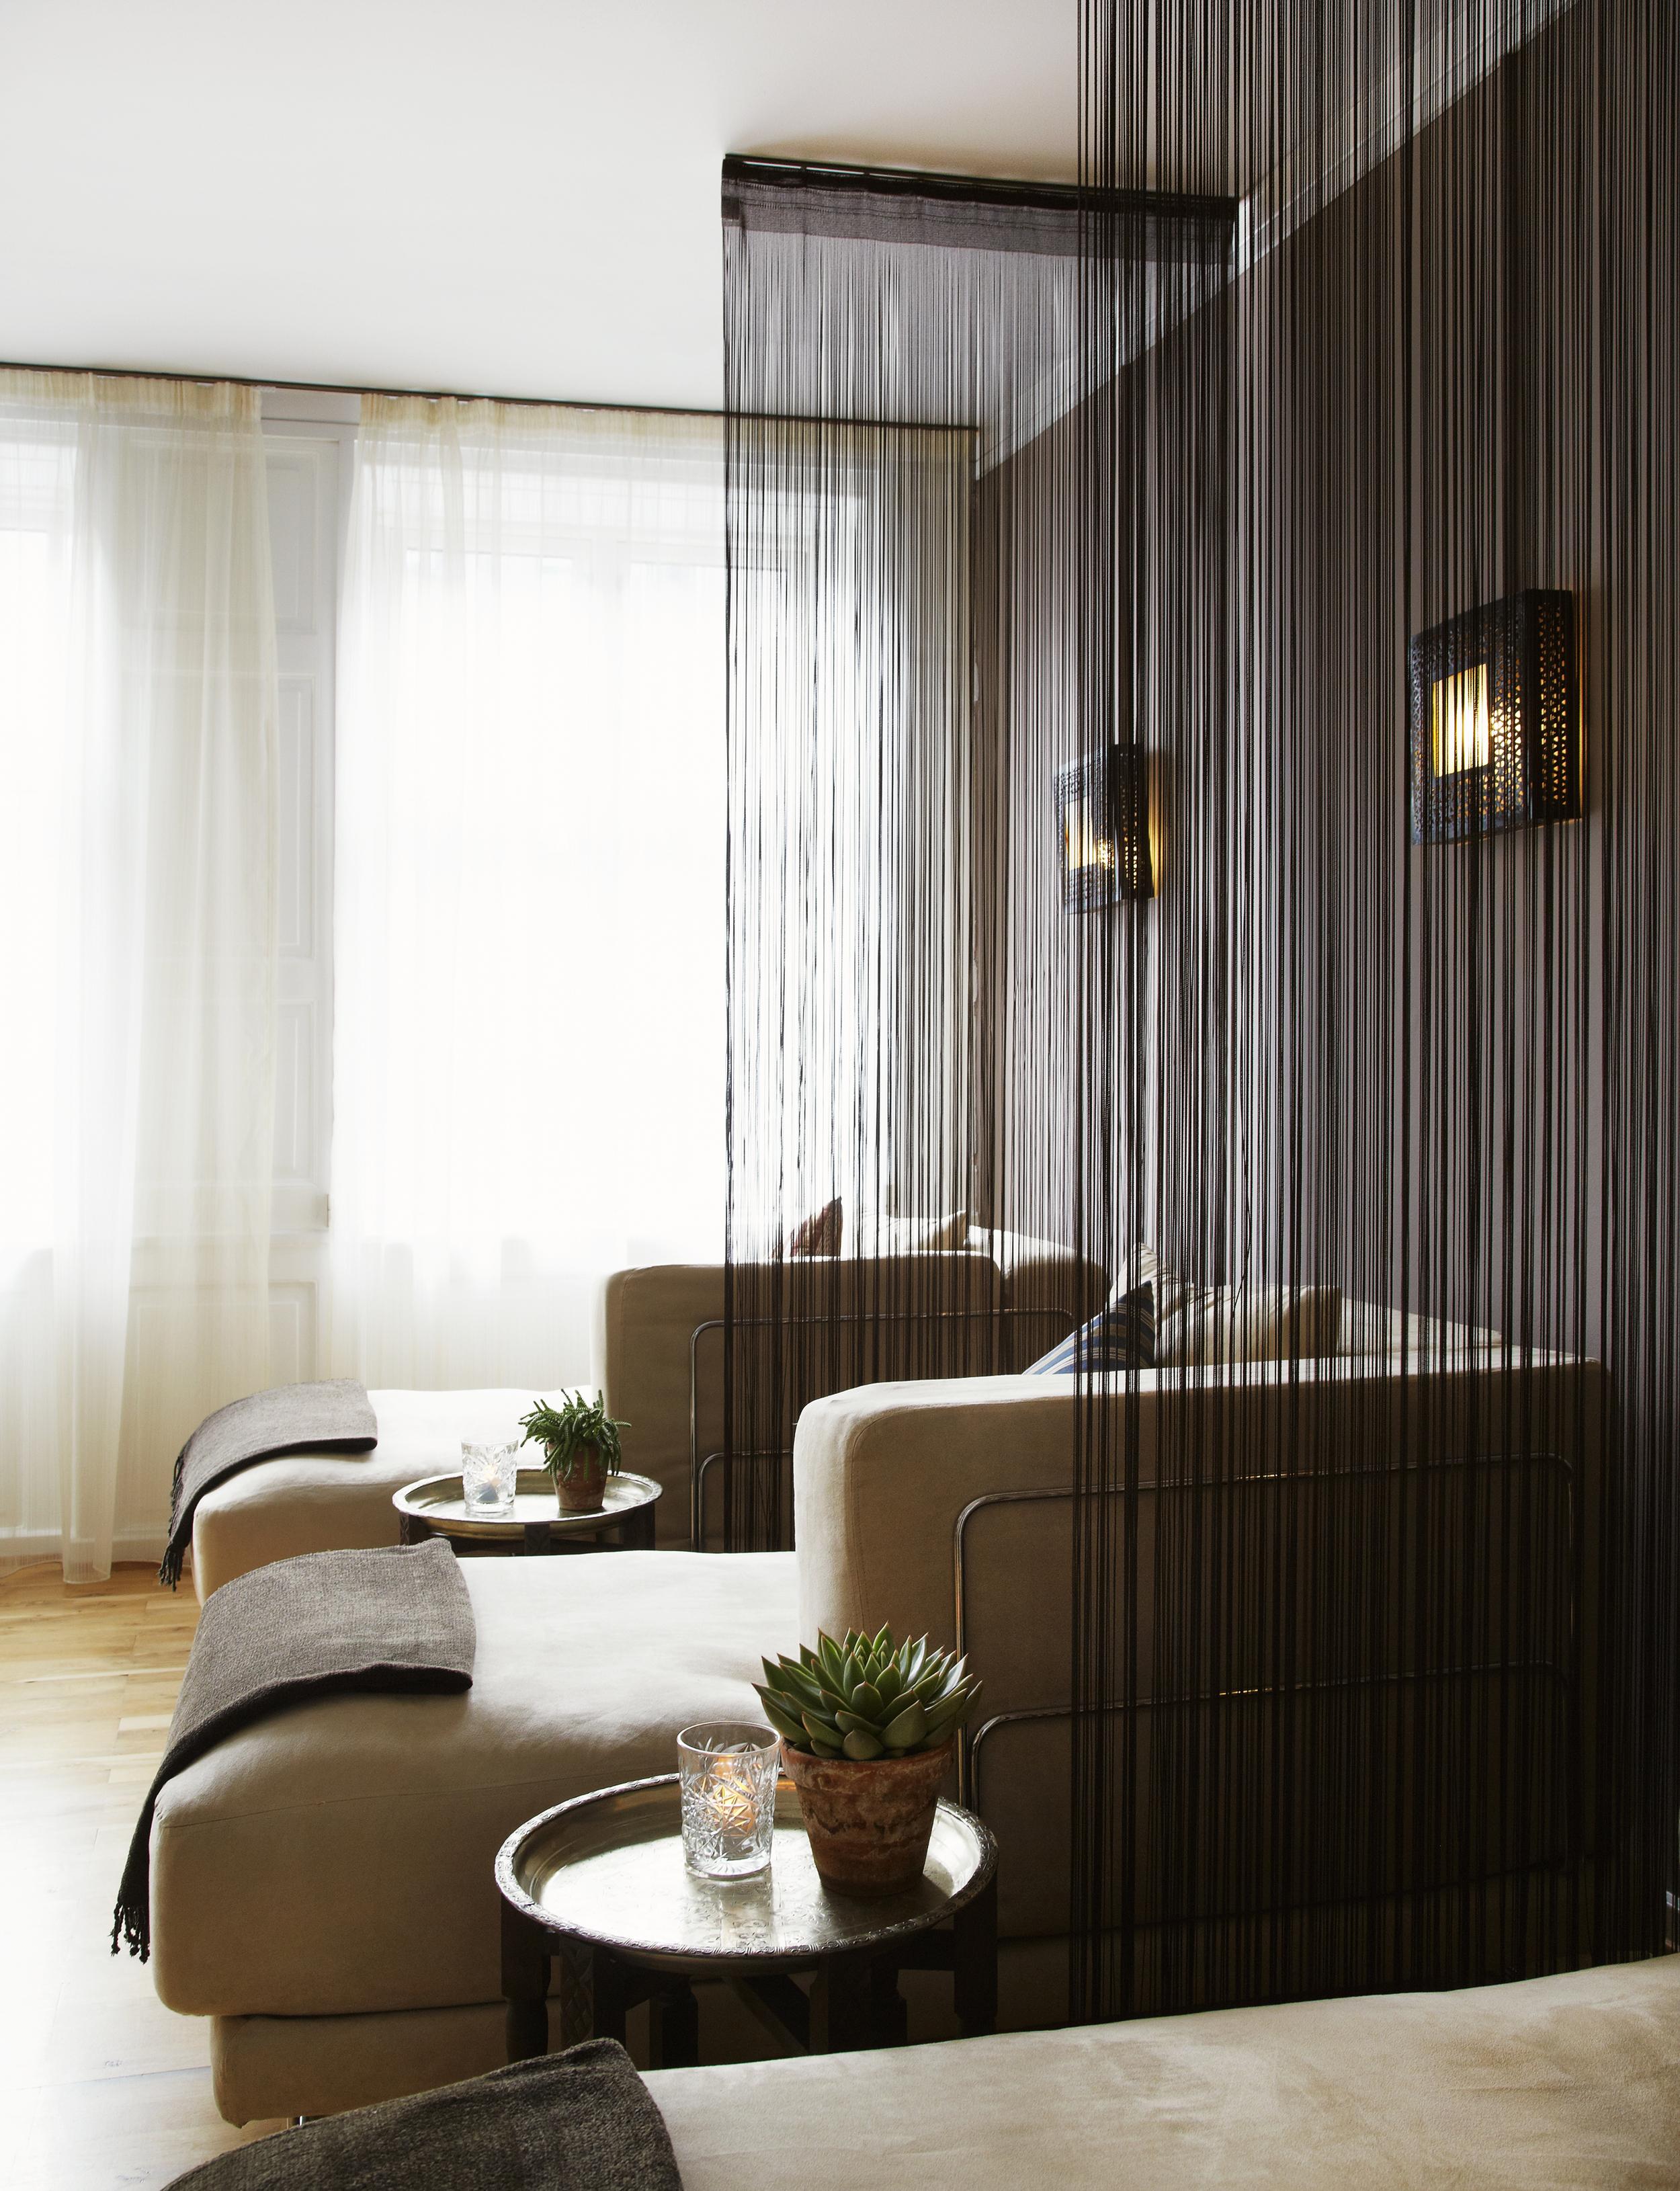 Beauty Avenue - Relaxation Lounge - Beauty Naps & Petite Facials